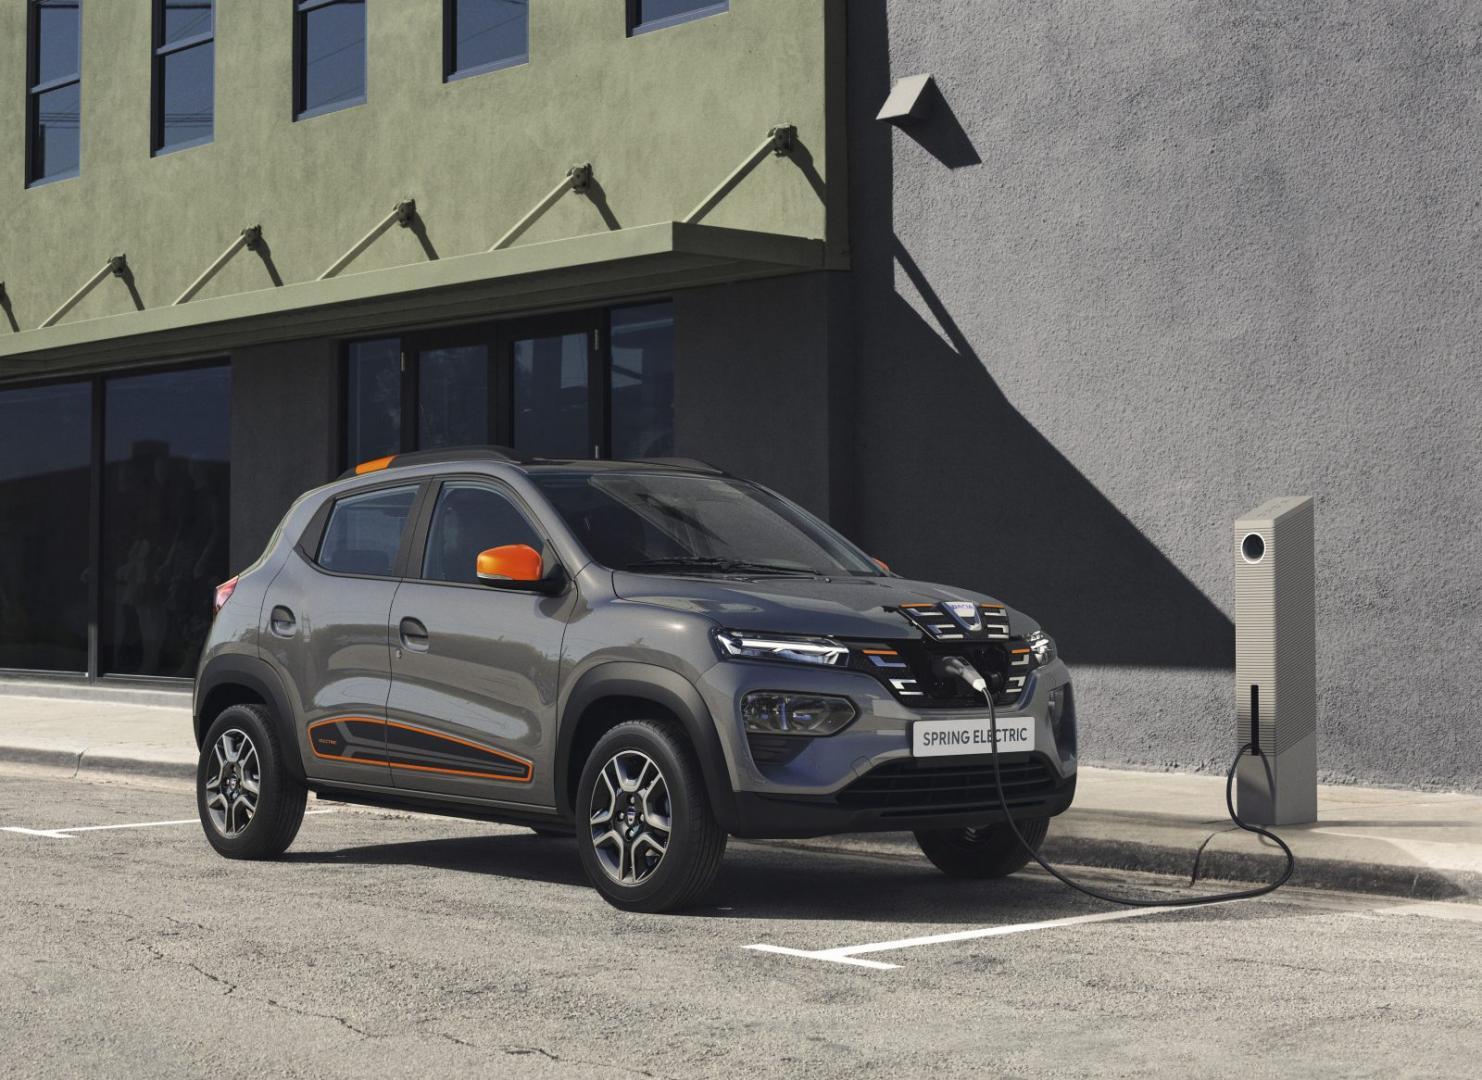 Goedkoopste elektrische auto Dacia Spring